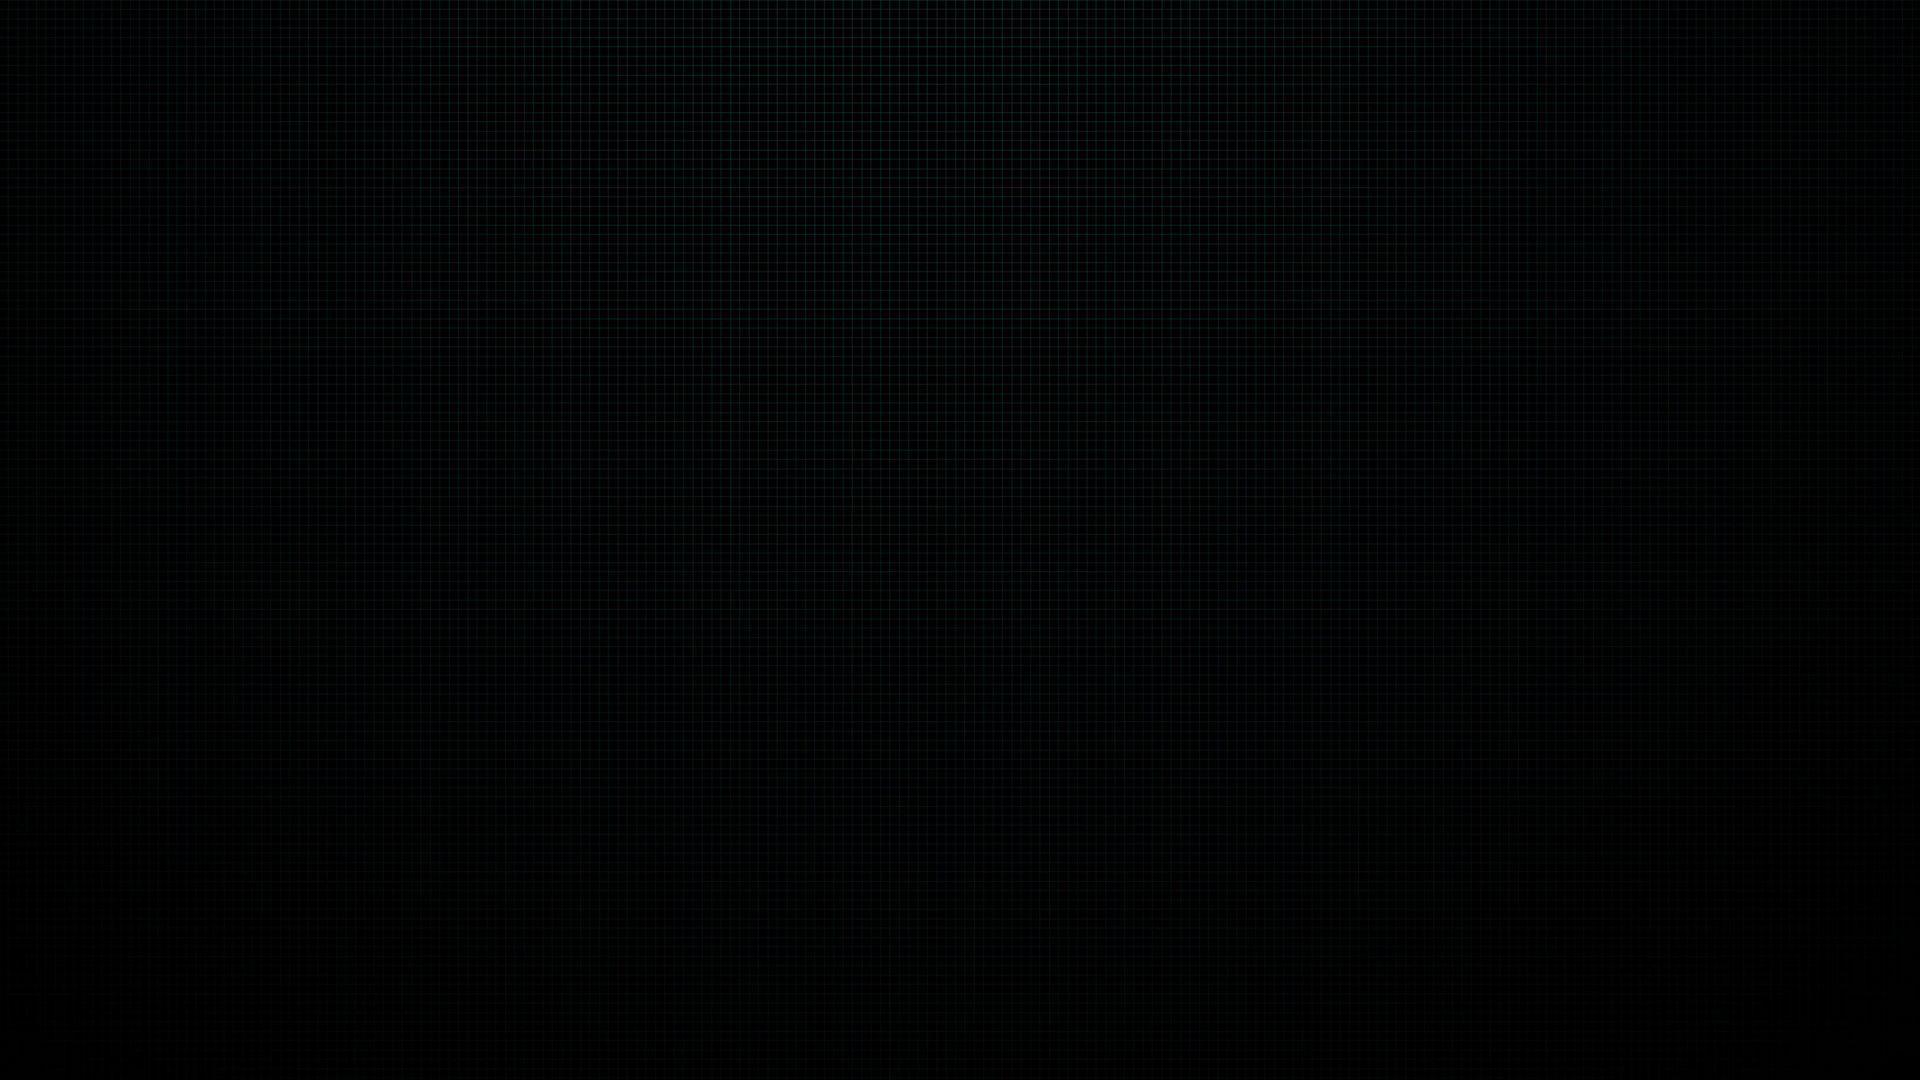 Plain Black Wallpapers - Wallpaper Cave